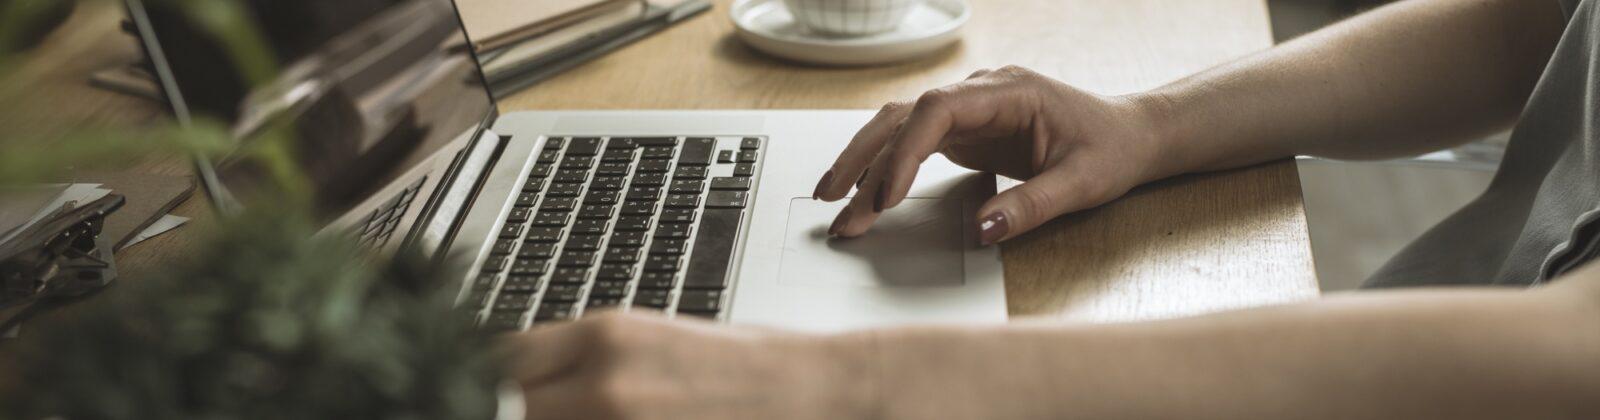 Creative briefs: Content briefs for freelance writers